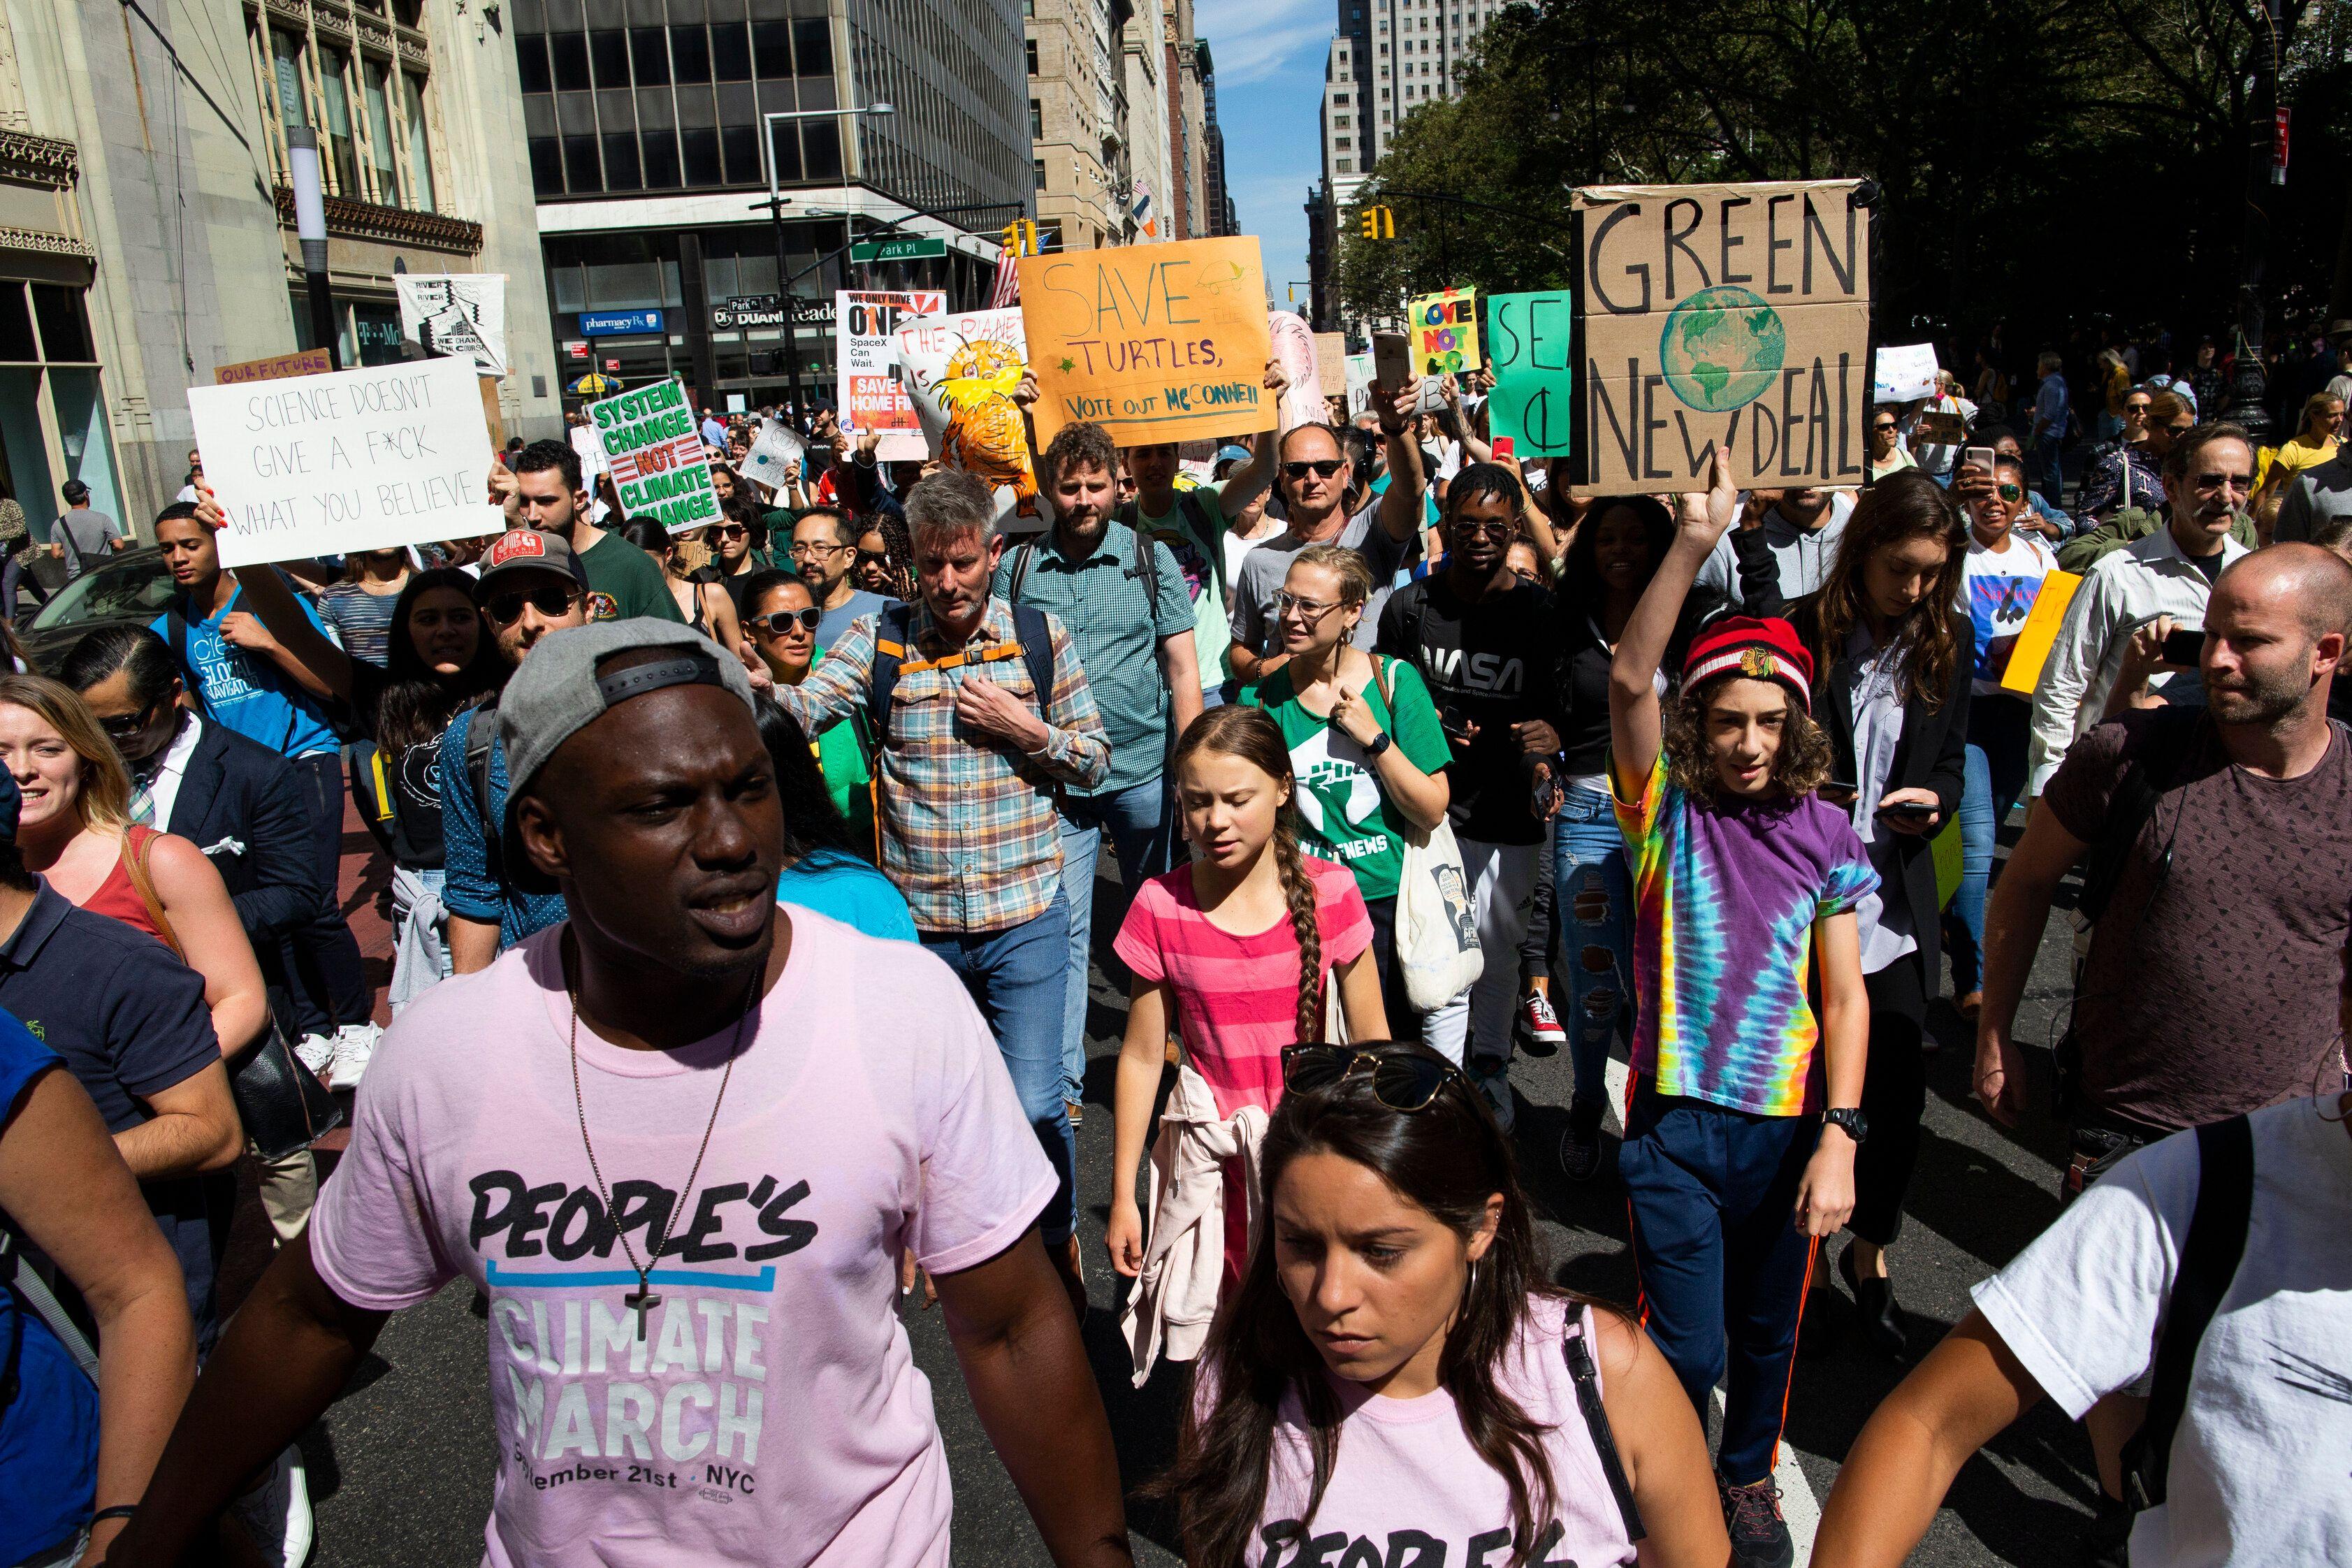 Swedish environmental activist Greta Thunberg, center, takes part during the Climate Strike, on Sept. 20, 2019 in New York.&n